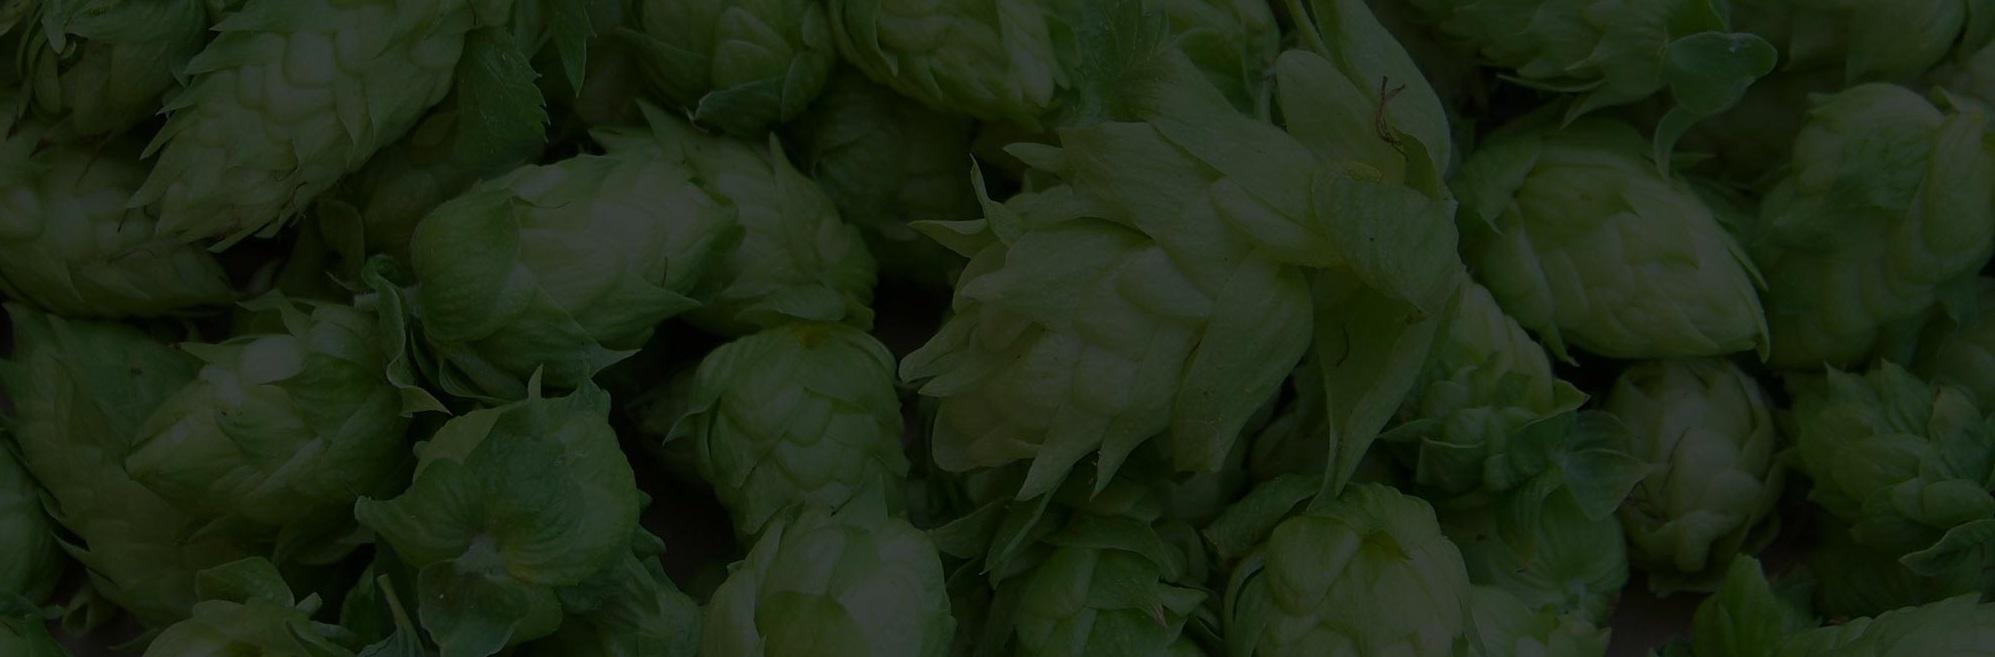 Beech-Tree-Blackheath-background-hops